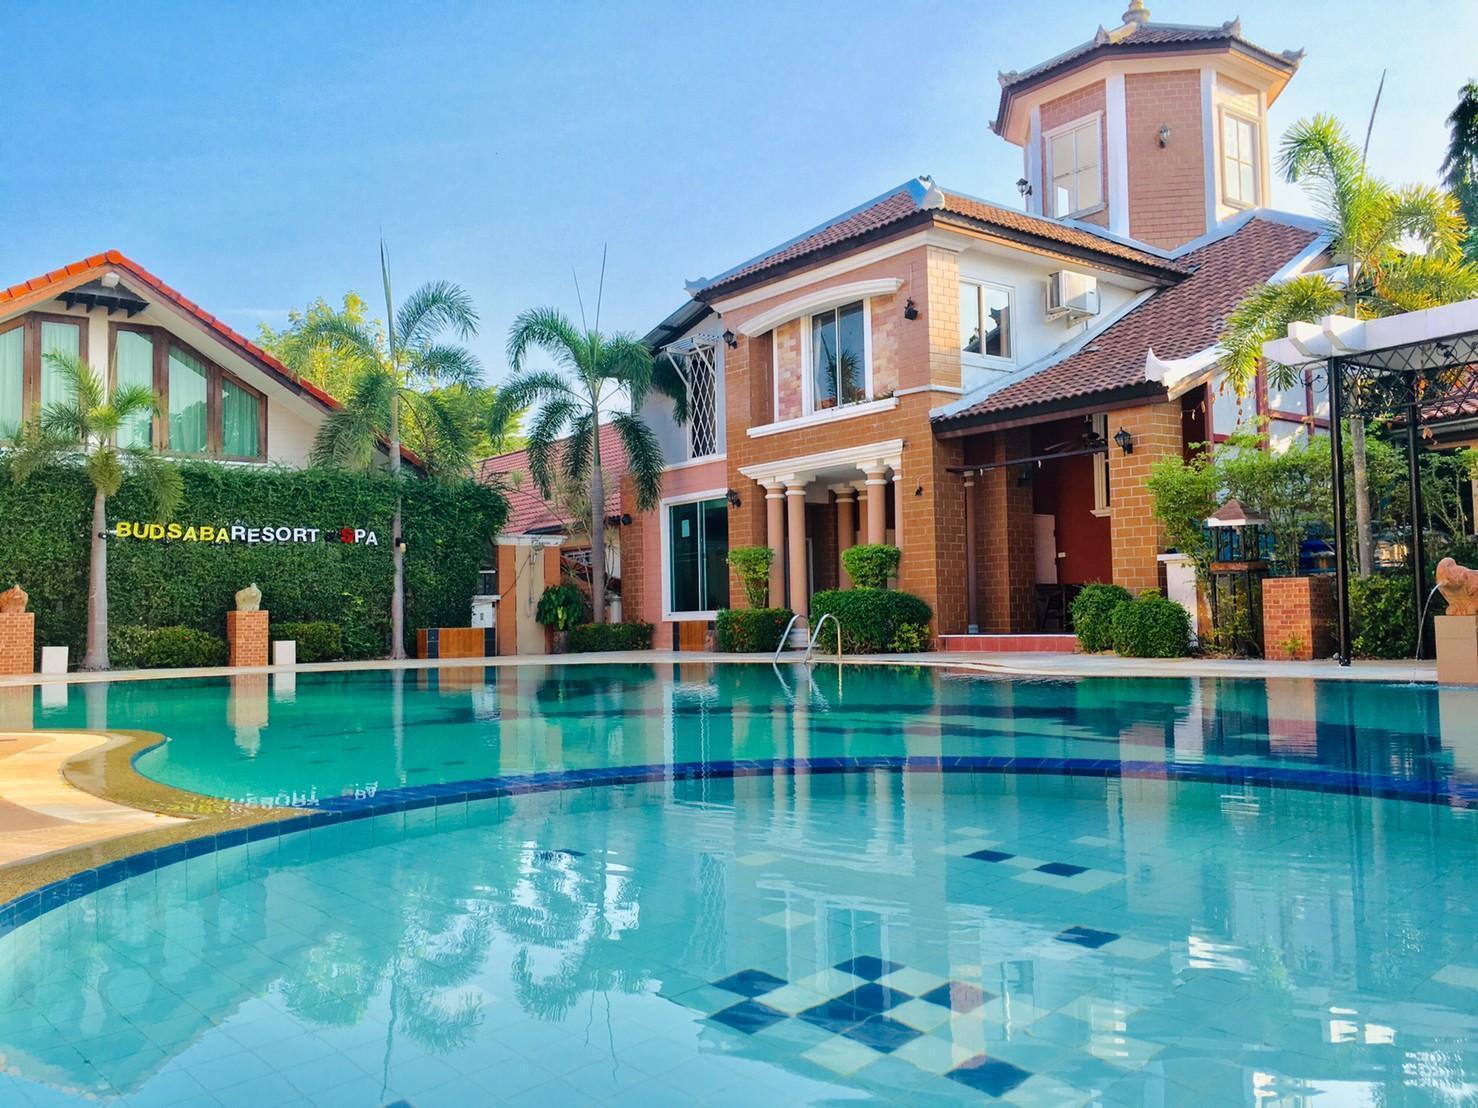 Budsaba Resort & Spa บุษบา รีสอร์ต แอนด์ สปา